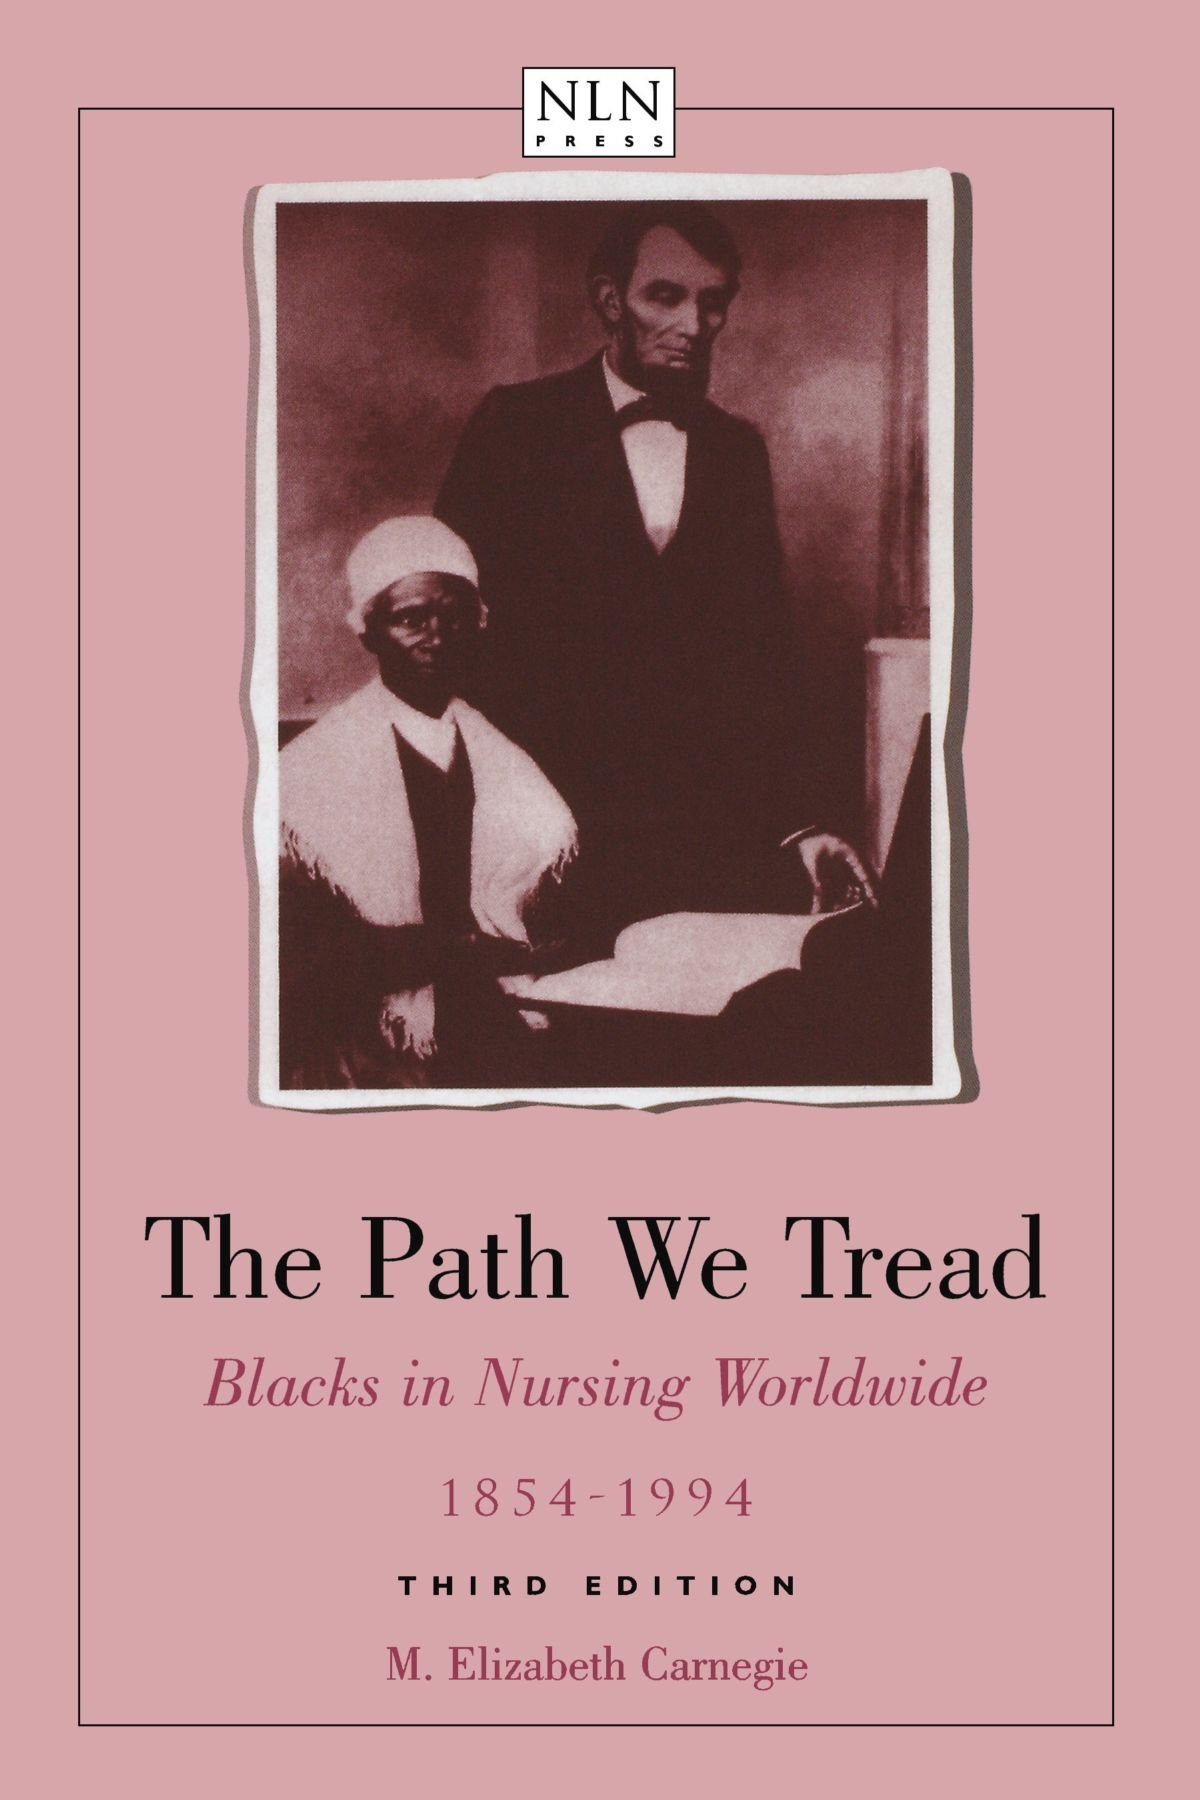 The Path We Tread: Blacks in Nursing Worldwide, 1854-1994